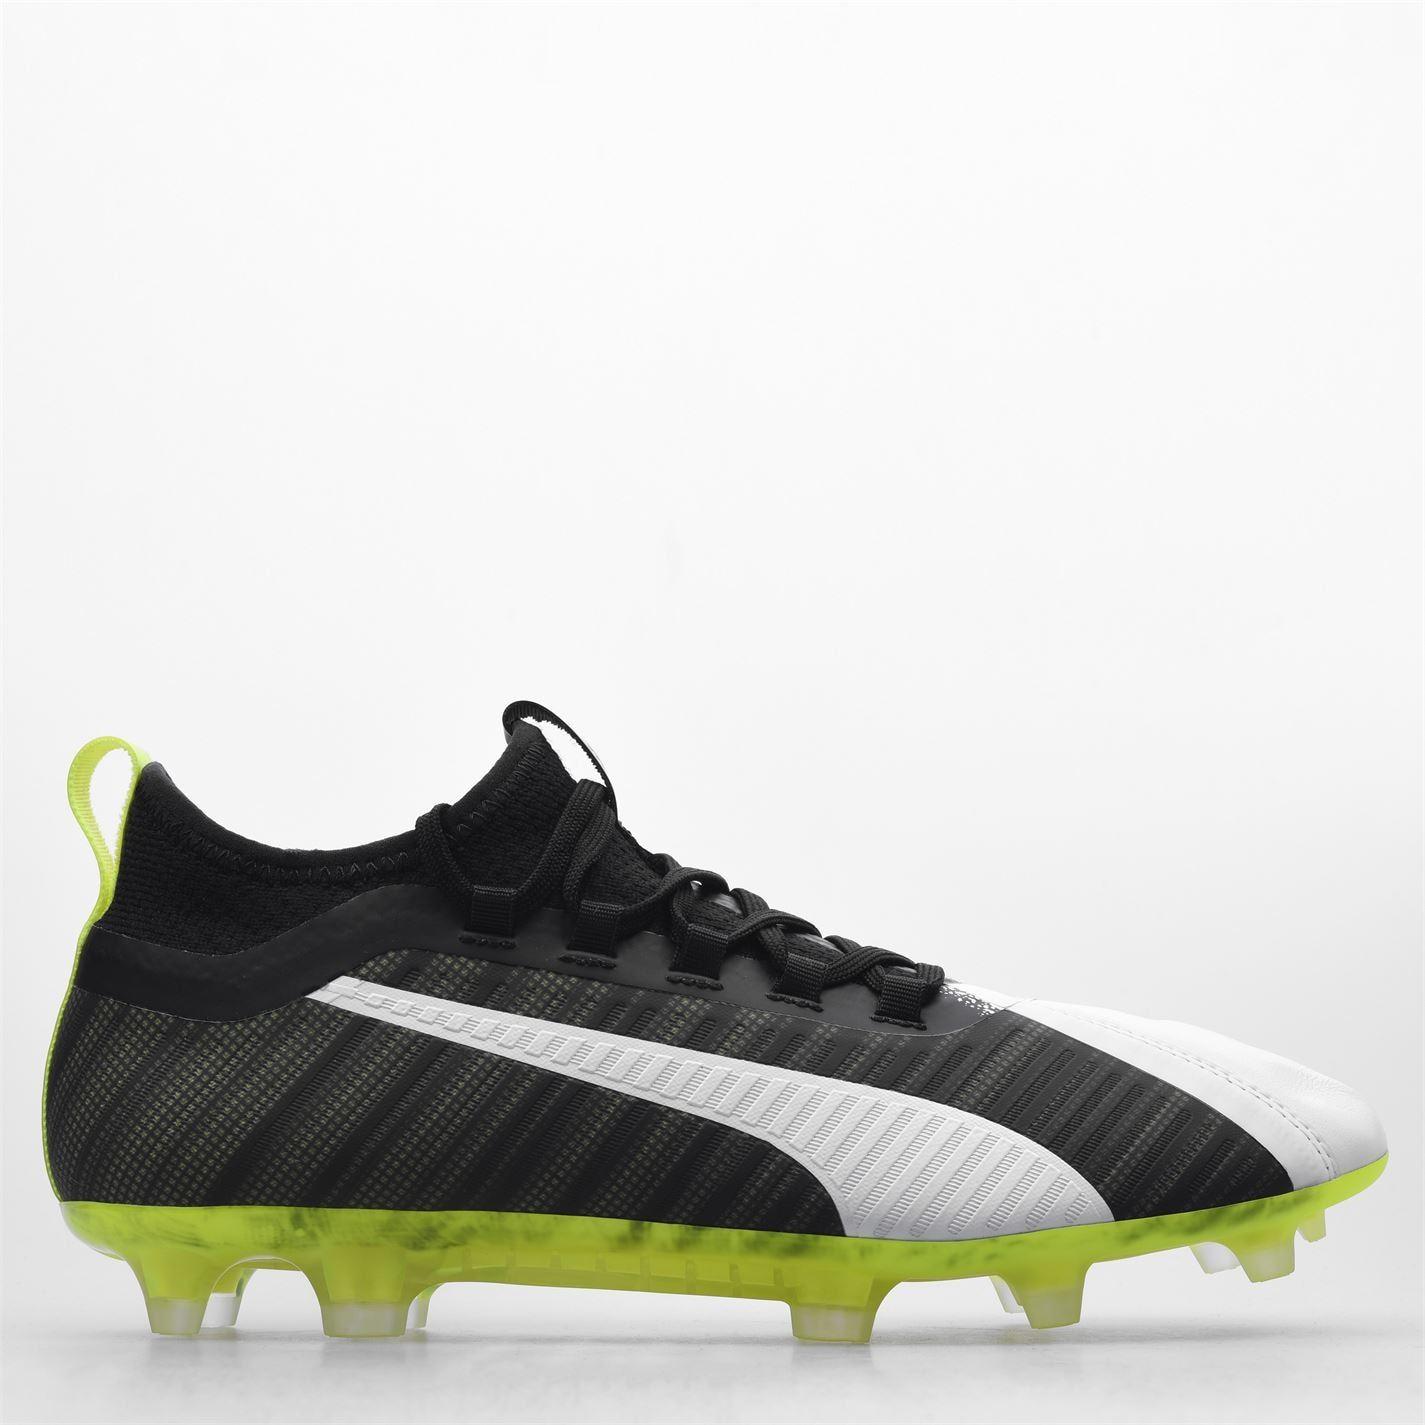 miniature 14 - Puma-5-2-FG-Firm-Ground-Football-Bottes-Homme-Chaussures-De-Foot-Crampons-Baskets